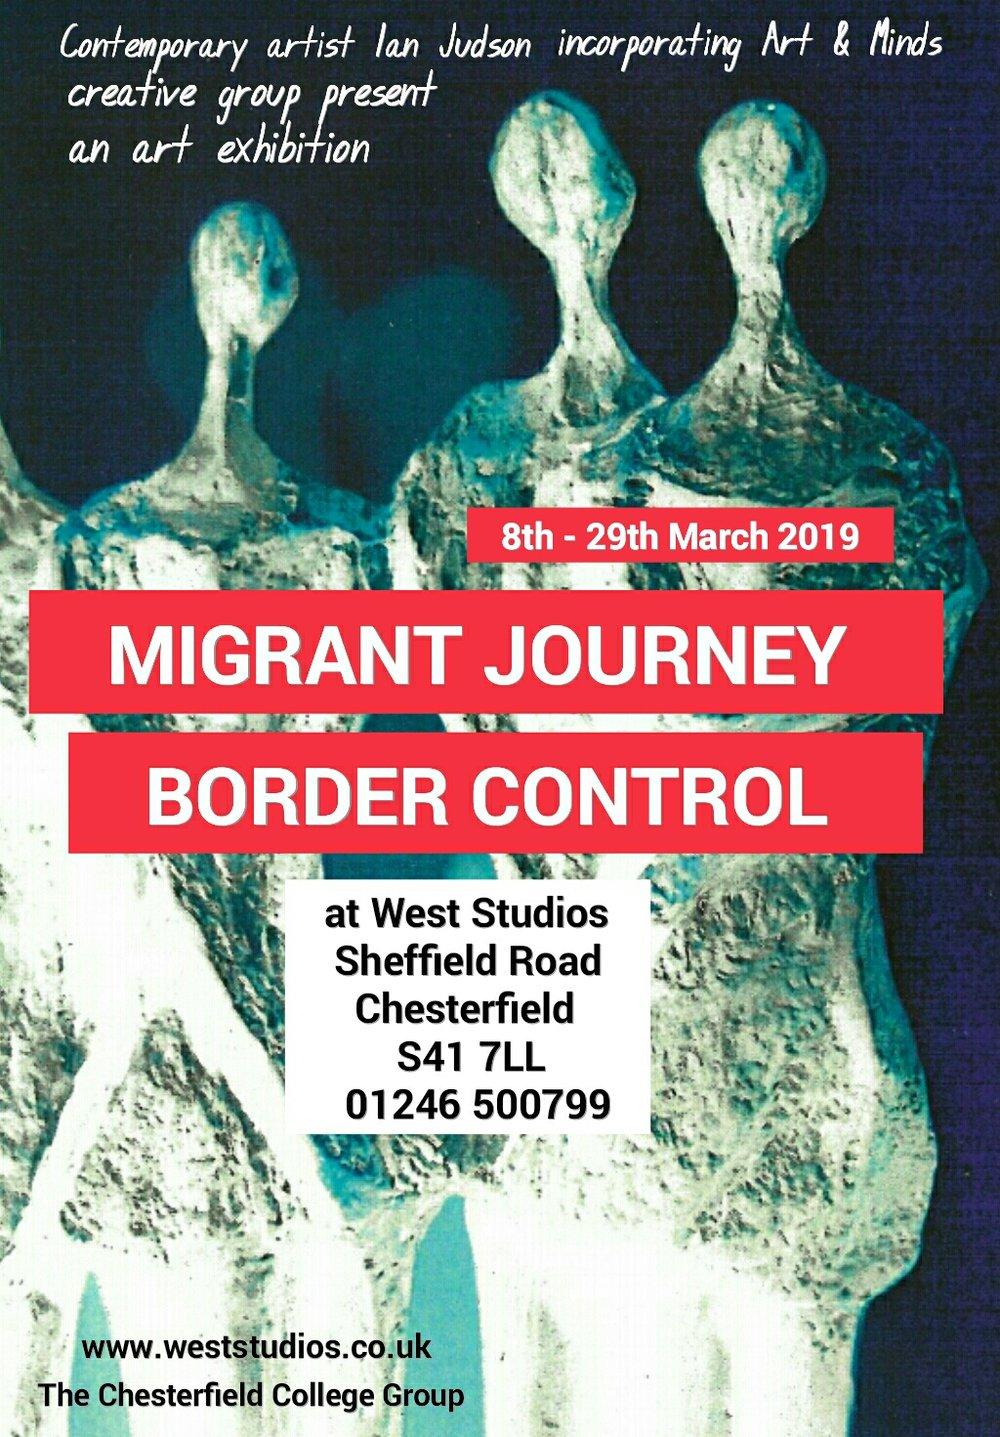 Migrant Journey Ian Judson.jpg